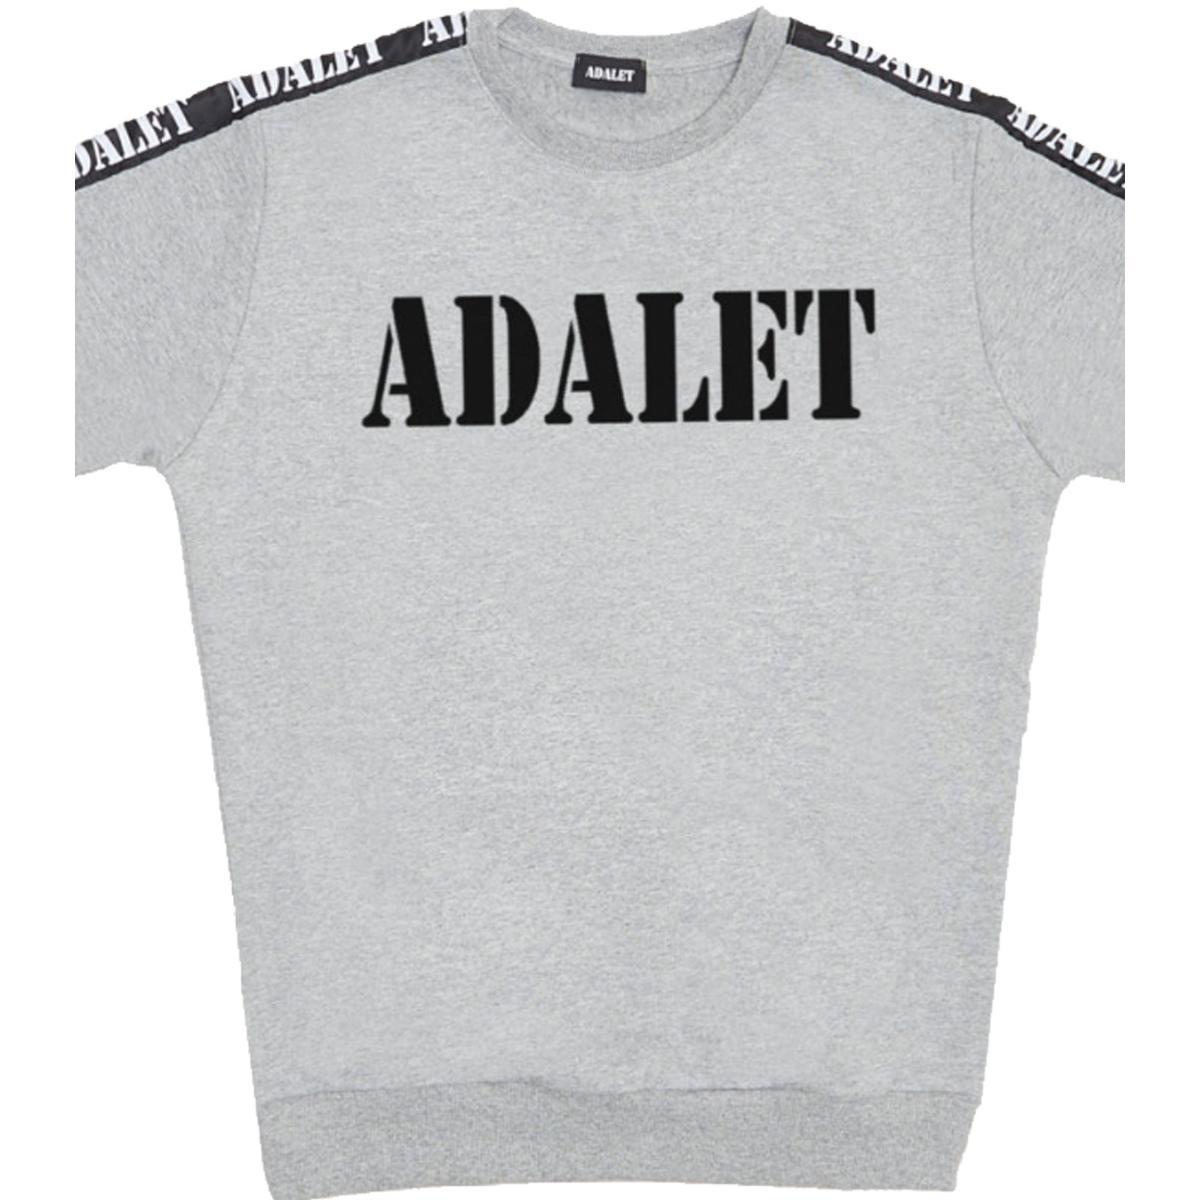 Felpa ADALET con stampa e bande laterali unisex rif. AD021